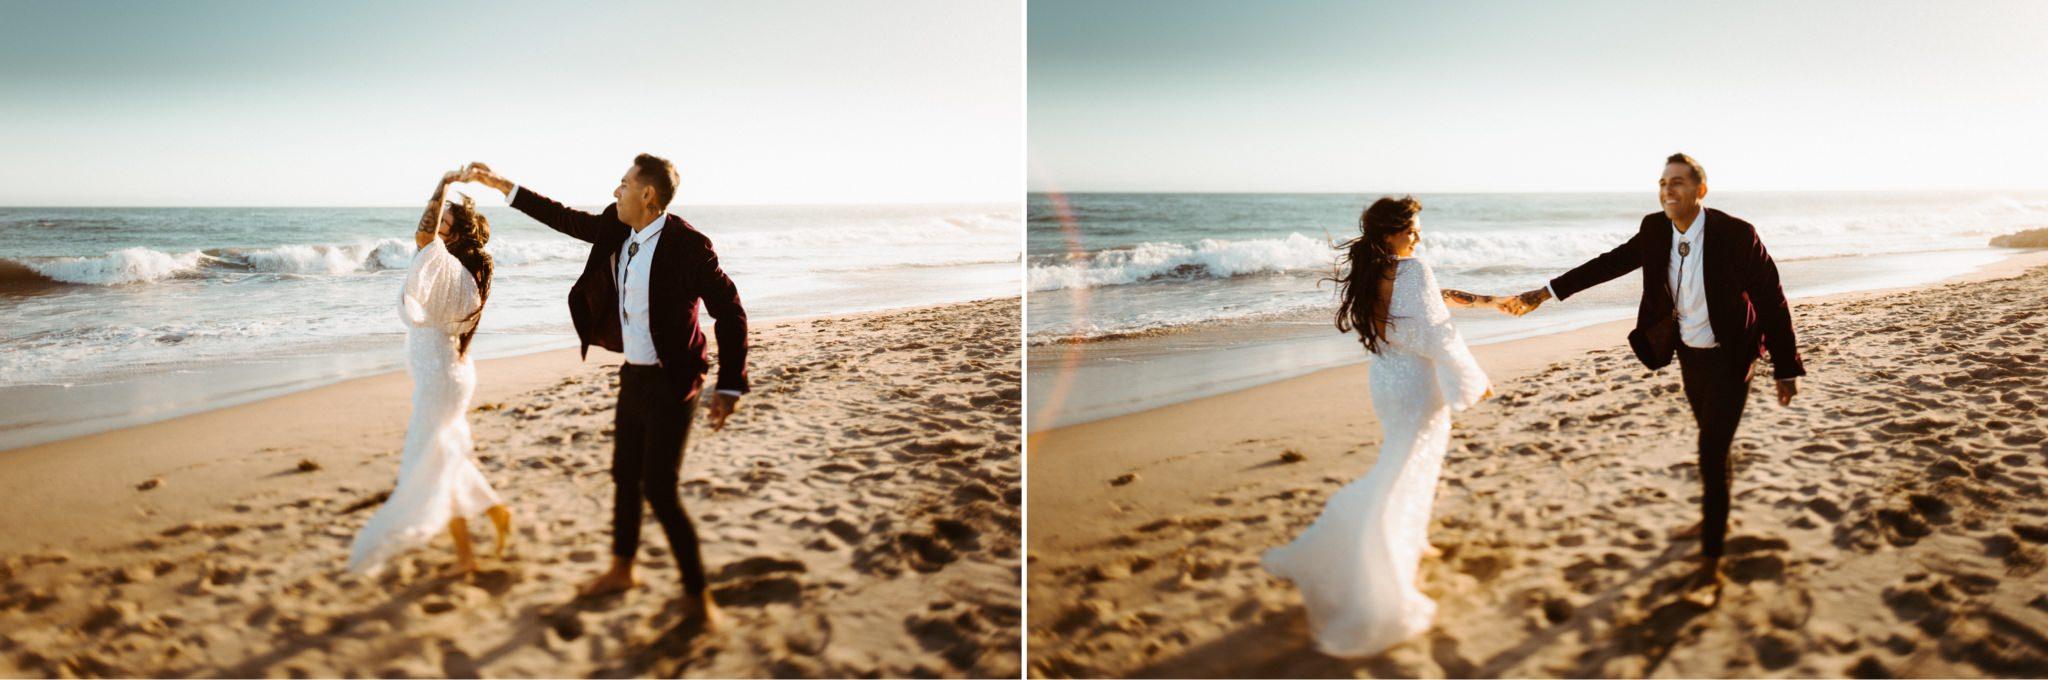 malibu elopement photographer 114